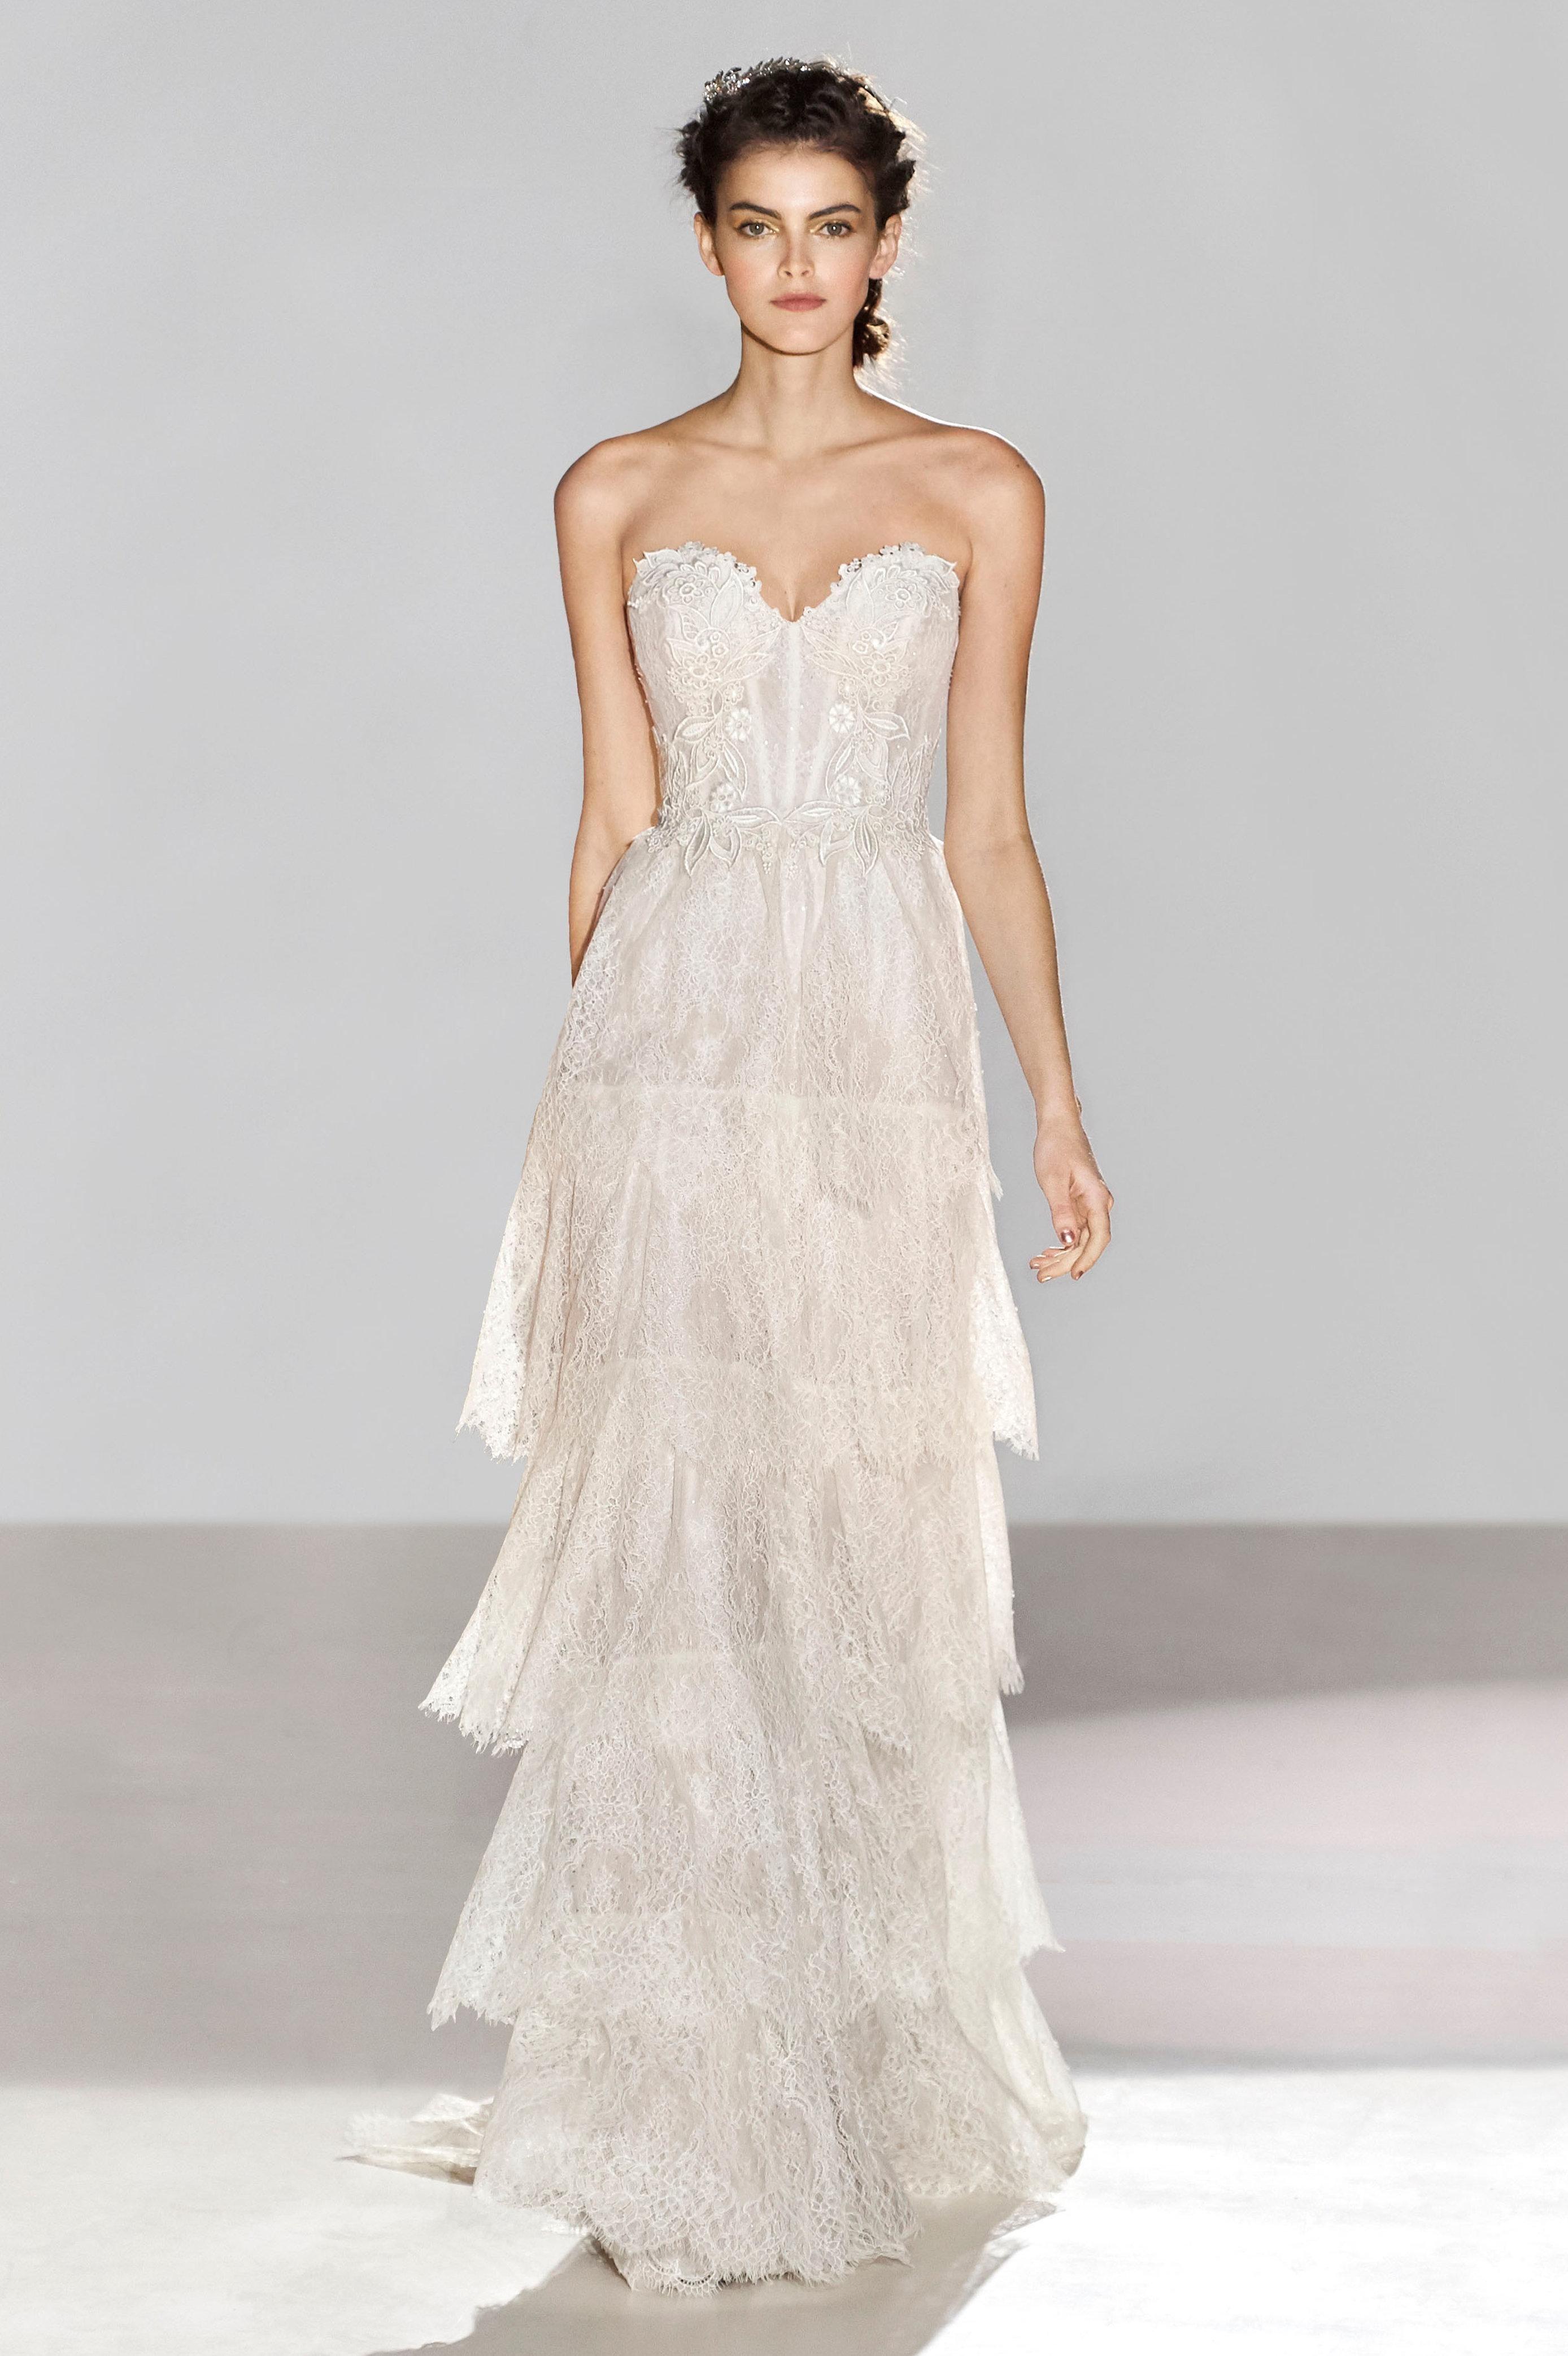 Lazaro Spring 2018 3659 Bridal Gown as seen on Demi Lovato ...